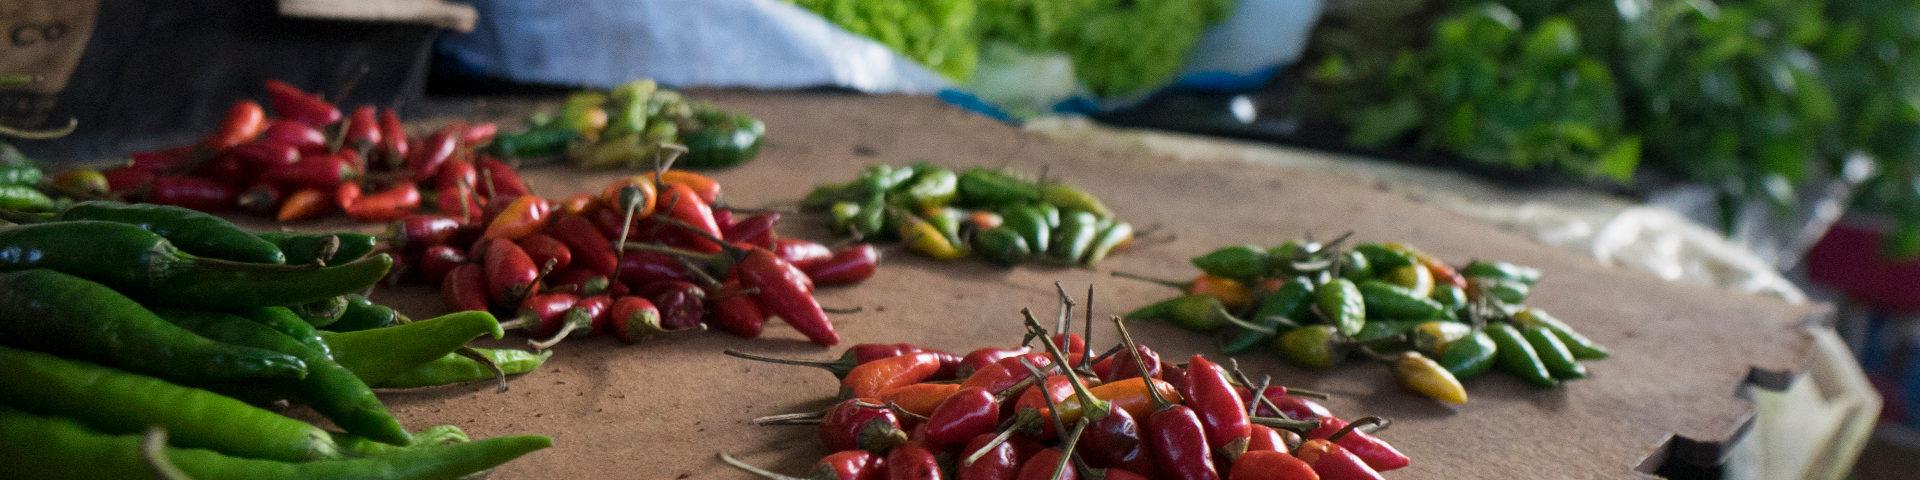 Chimoio chilli peppers